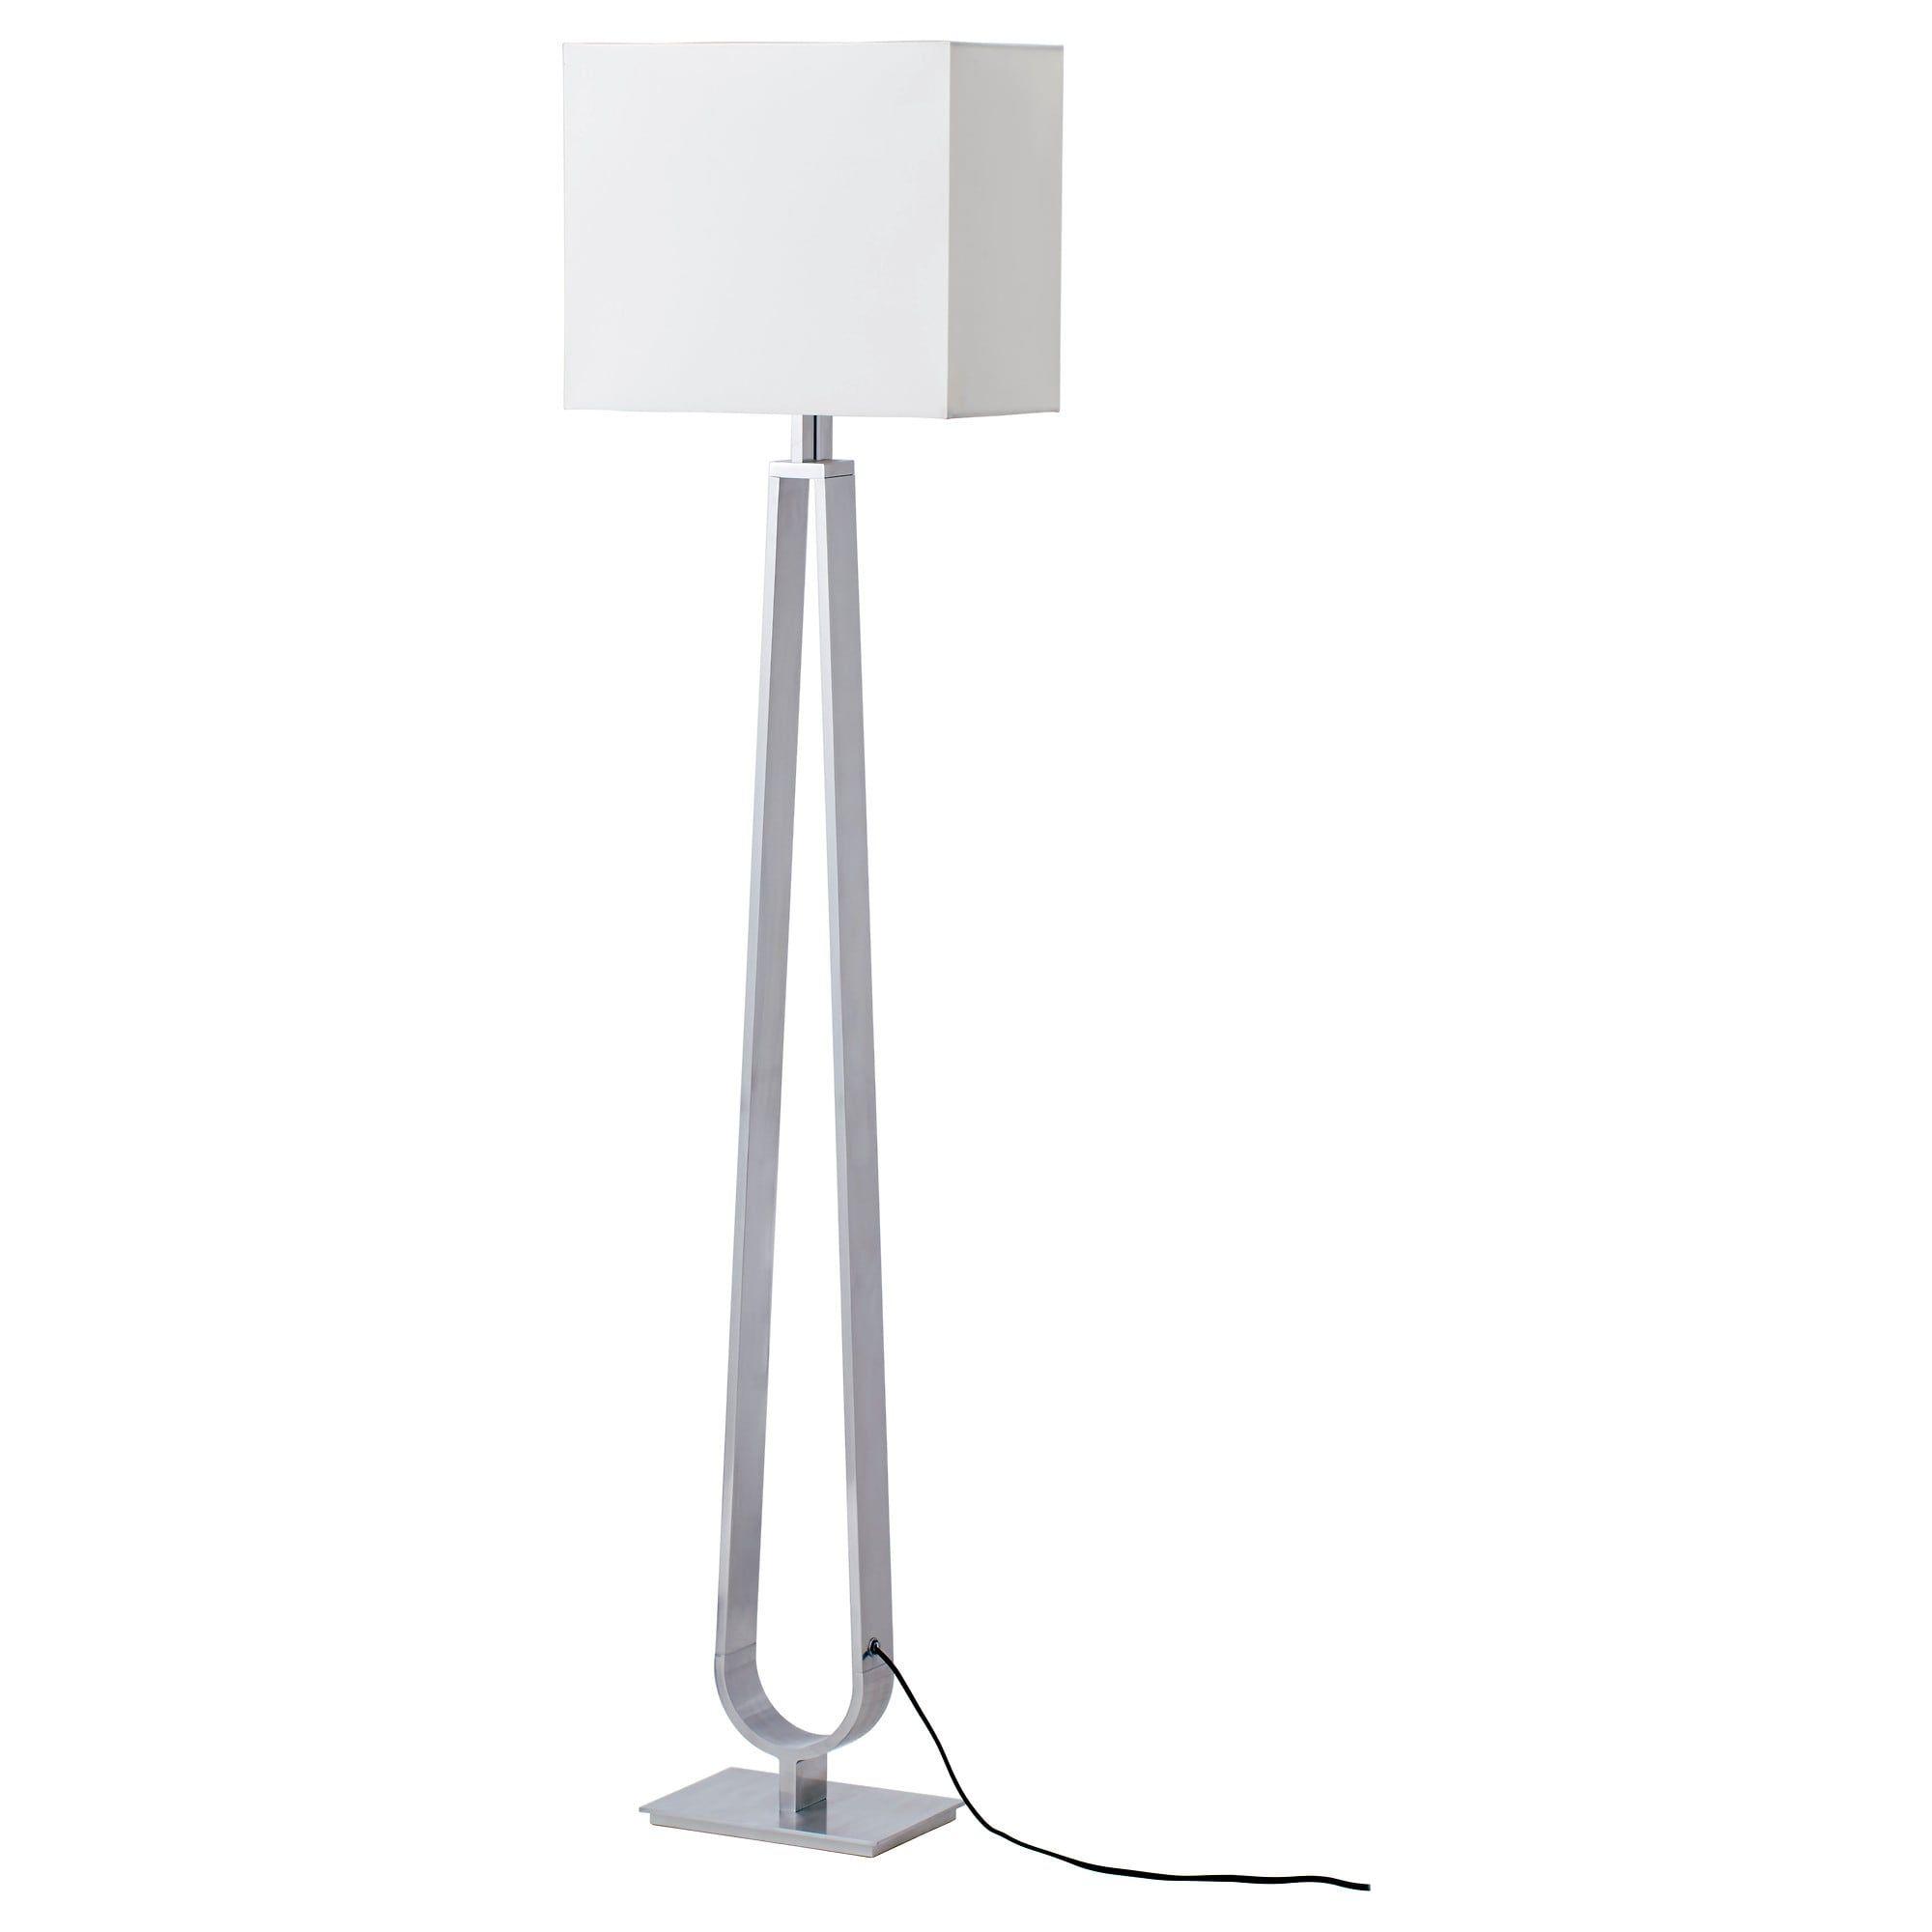 KLABB off white, Floor lamp IKEA | Floor lamp, Lamp